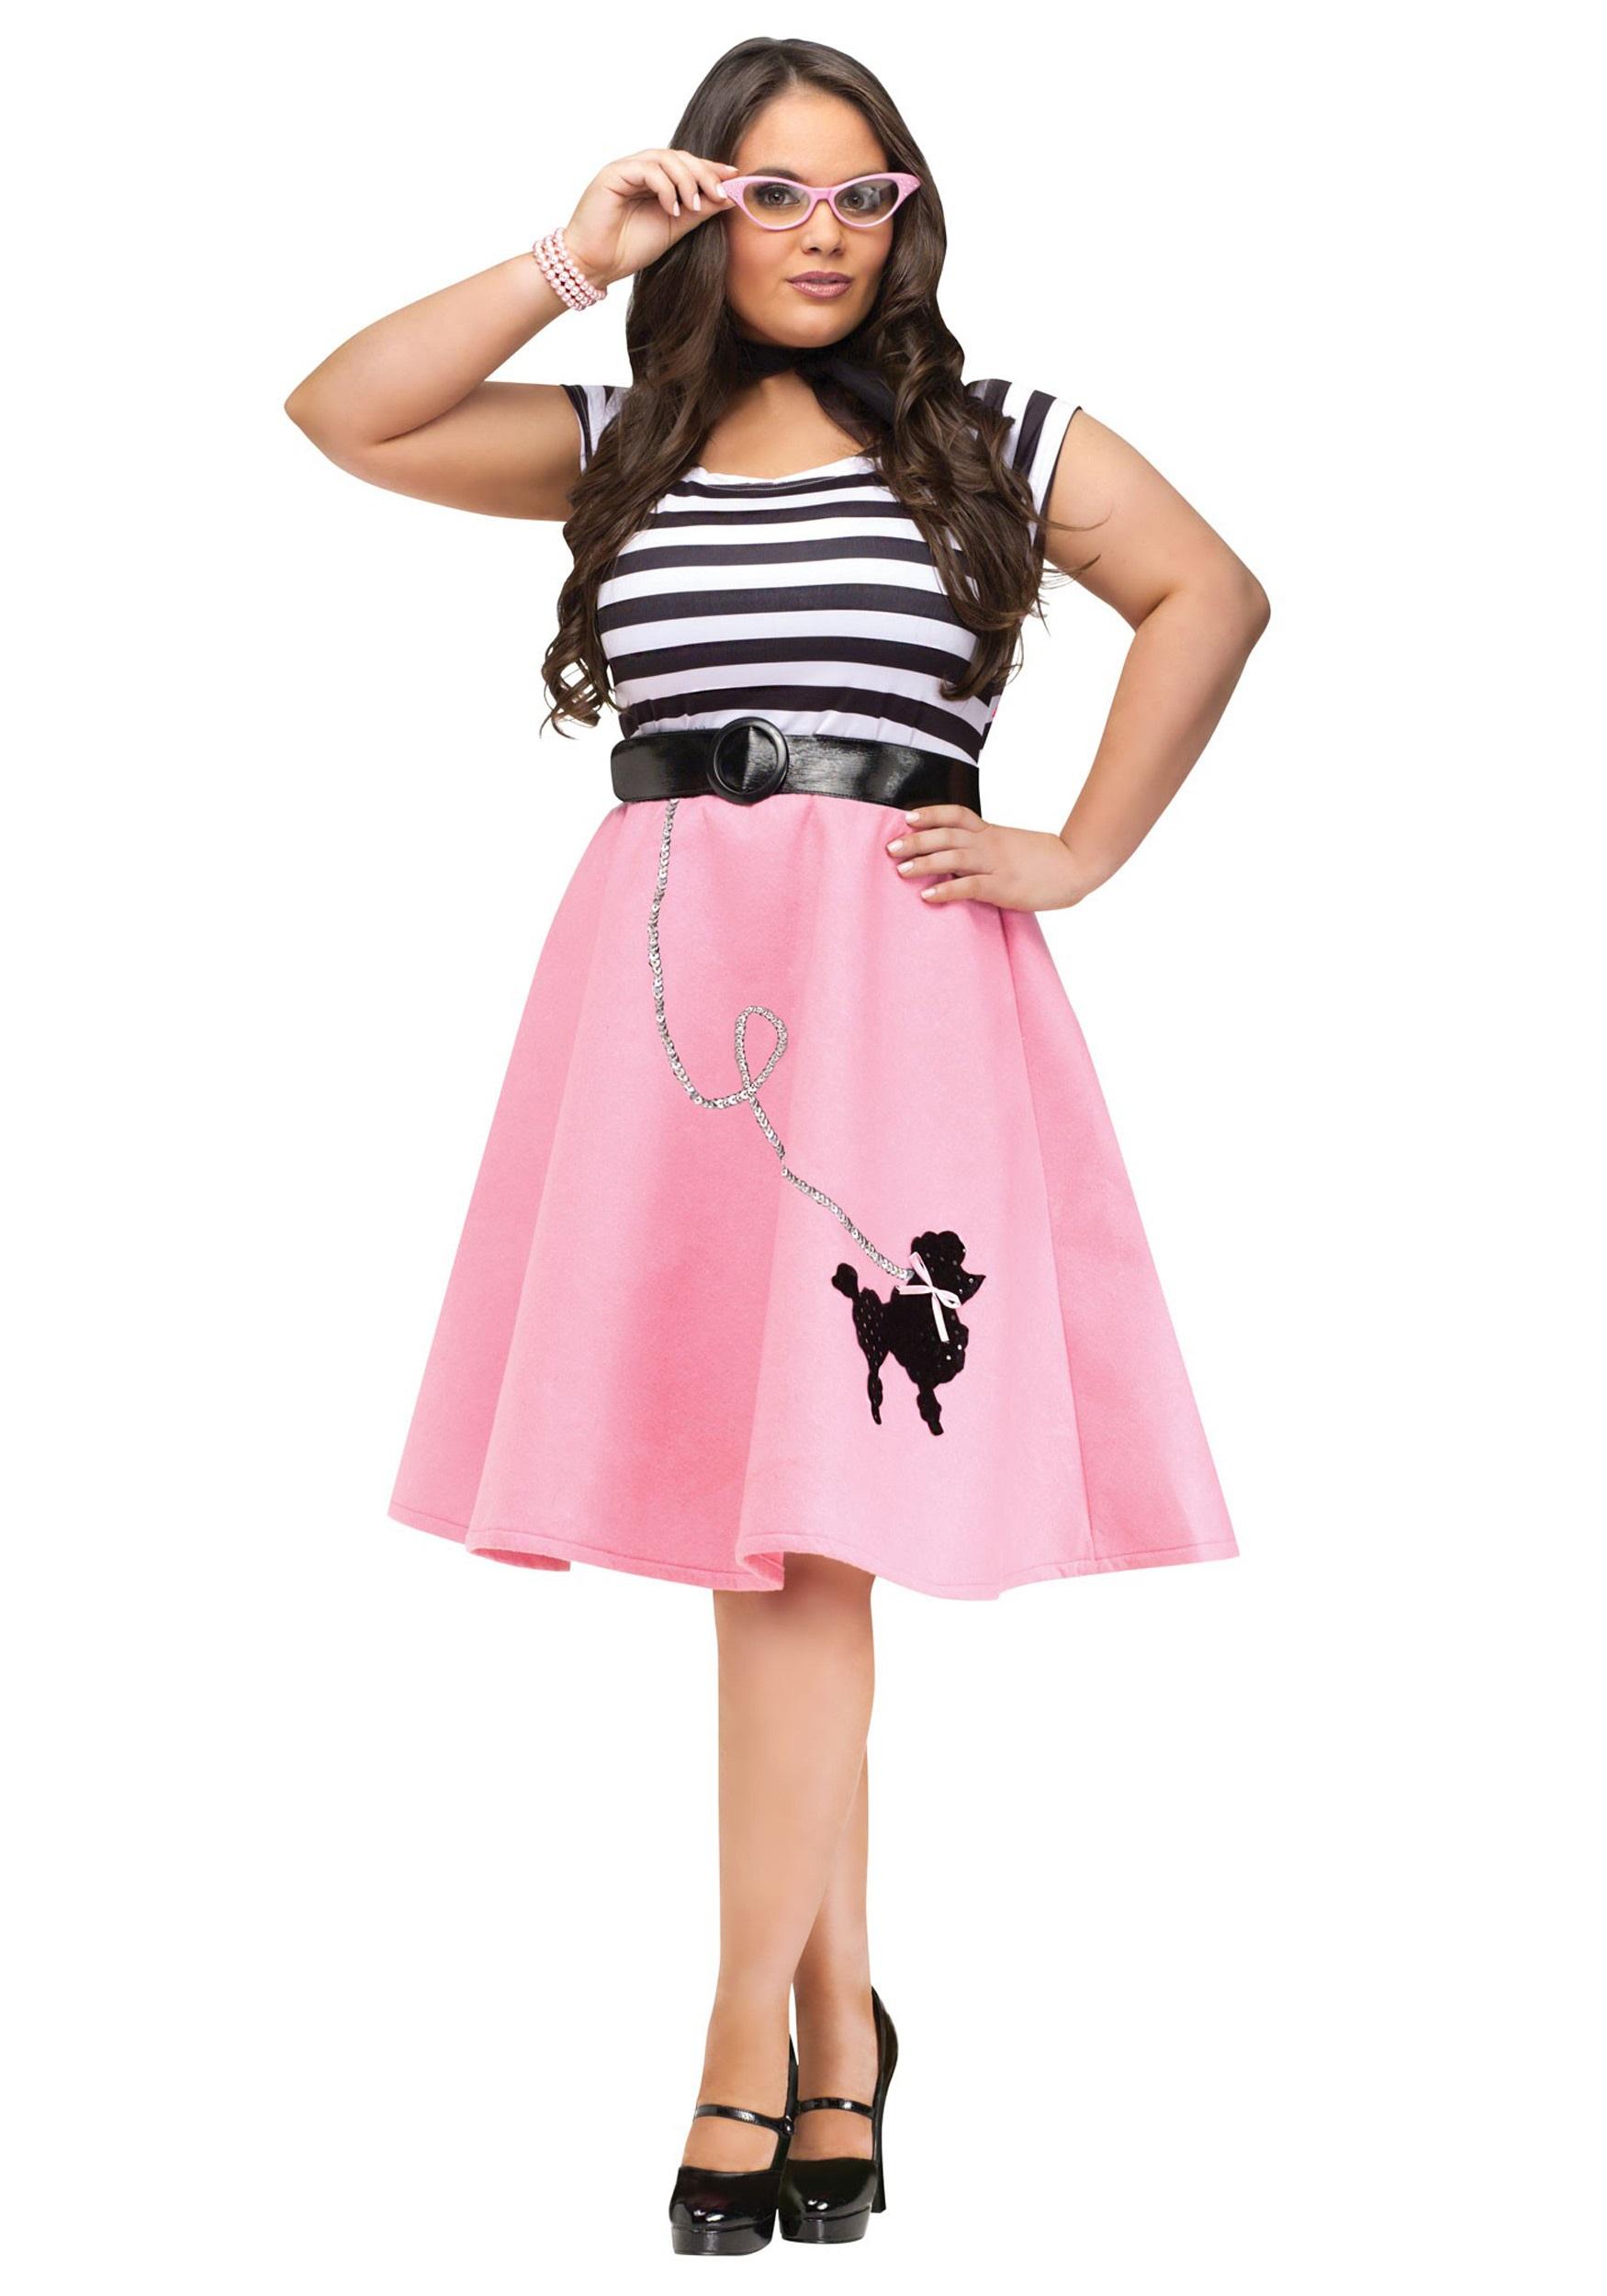 60e9c4ffa07 Plus Size Women s Poodle Skirt Costume